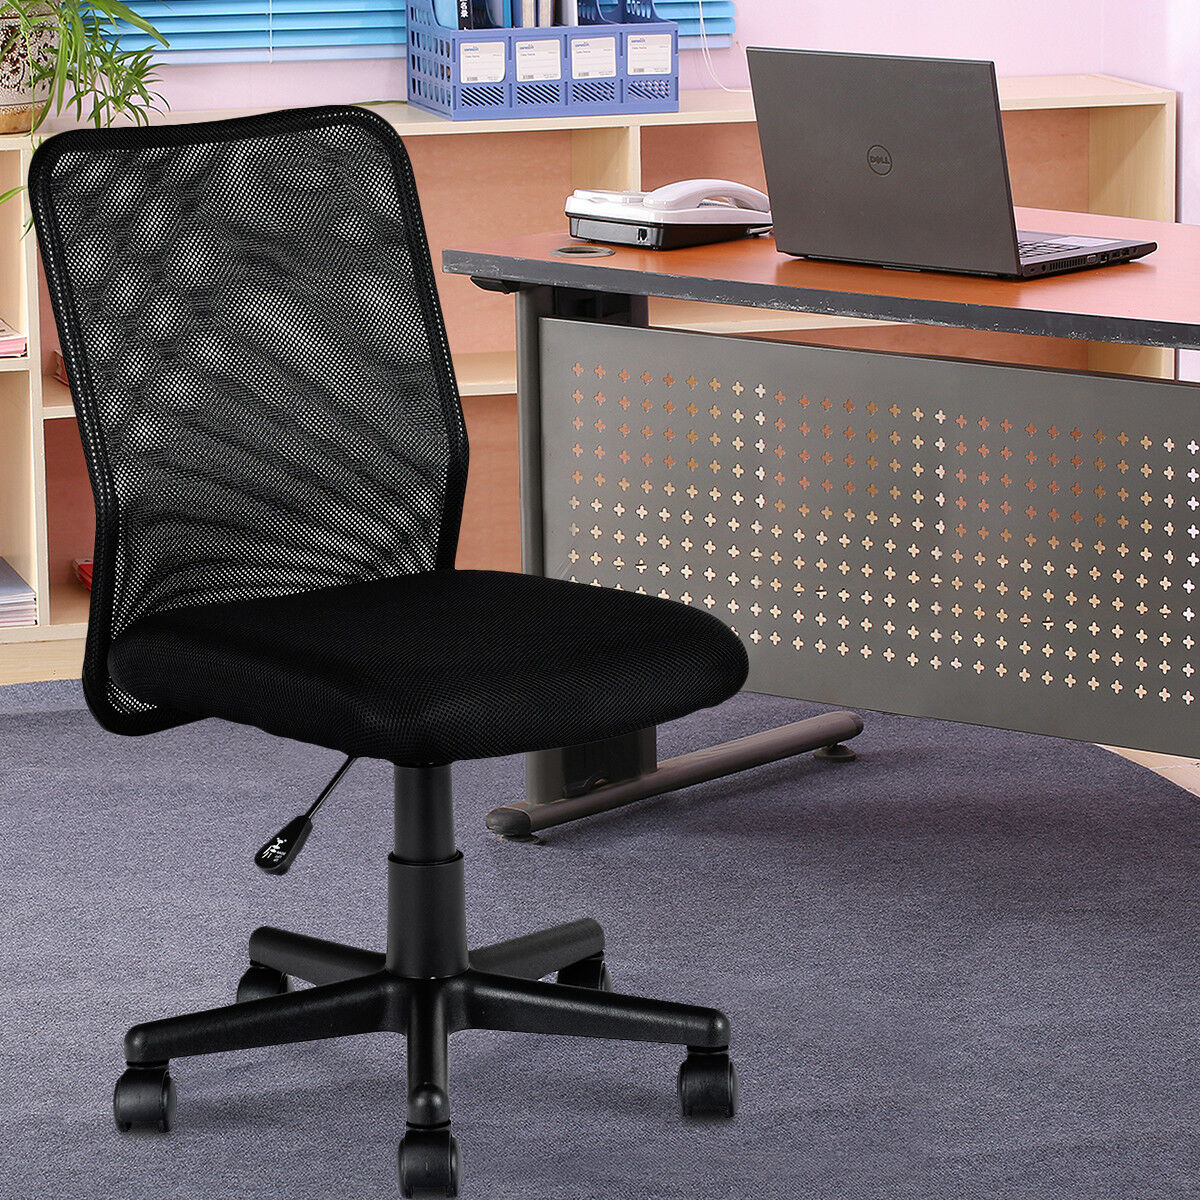 Phenomenal New Mid Back Adjustable Ergonomic Mesh Swivel Durable Office Desk Task Chair Download Free Architecture Designs Grimeyleaguecom